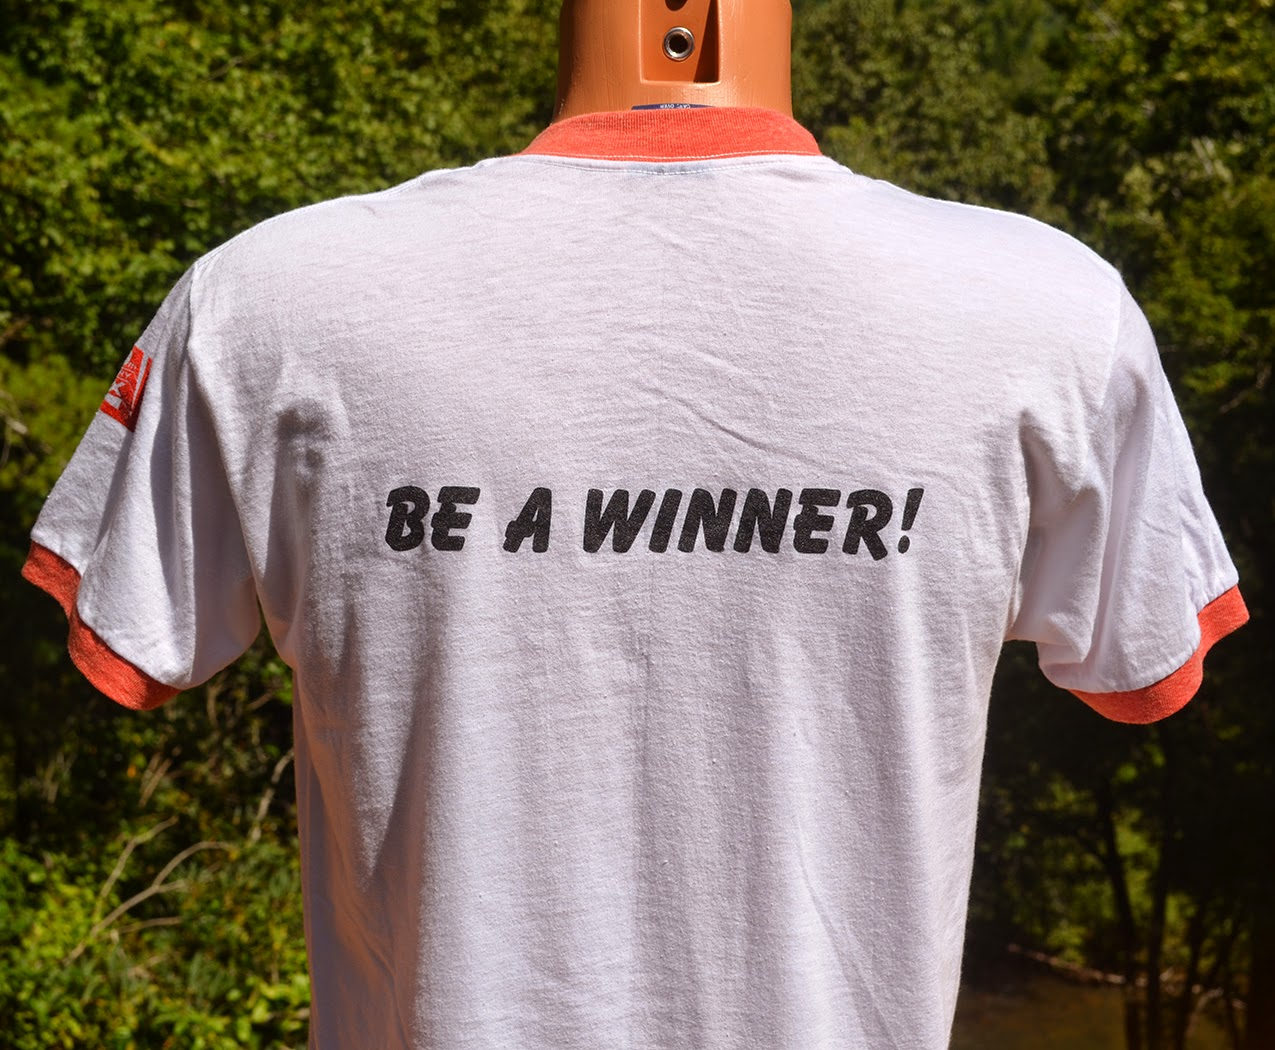 https://www.etsy.com/listing/203302961/vintage-70s-t-shirt-25000-dollar-pyramid